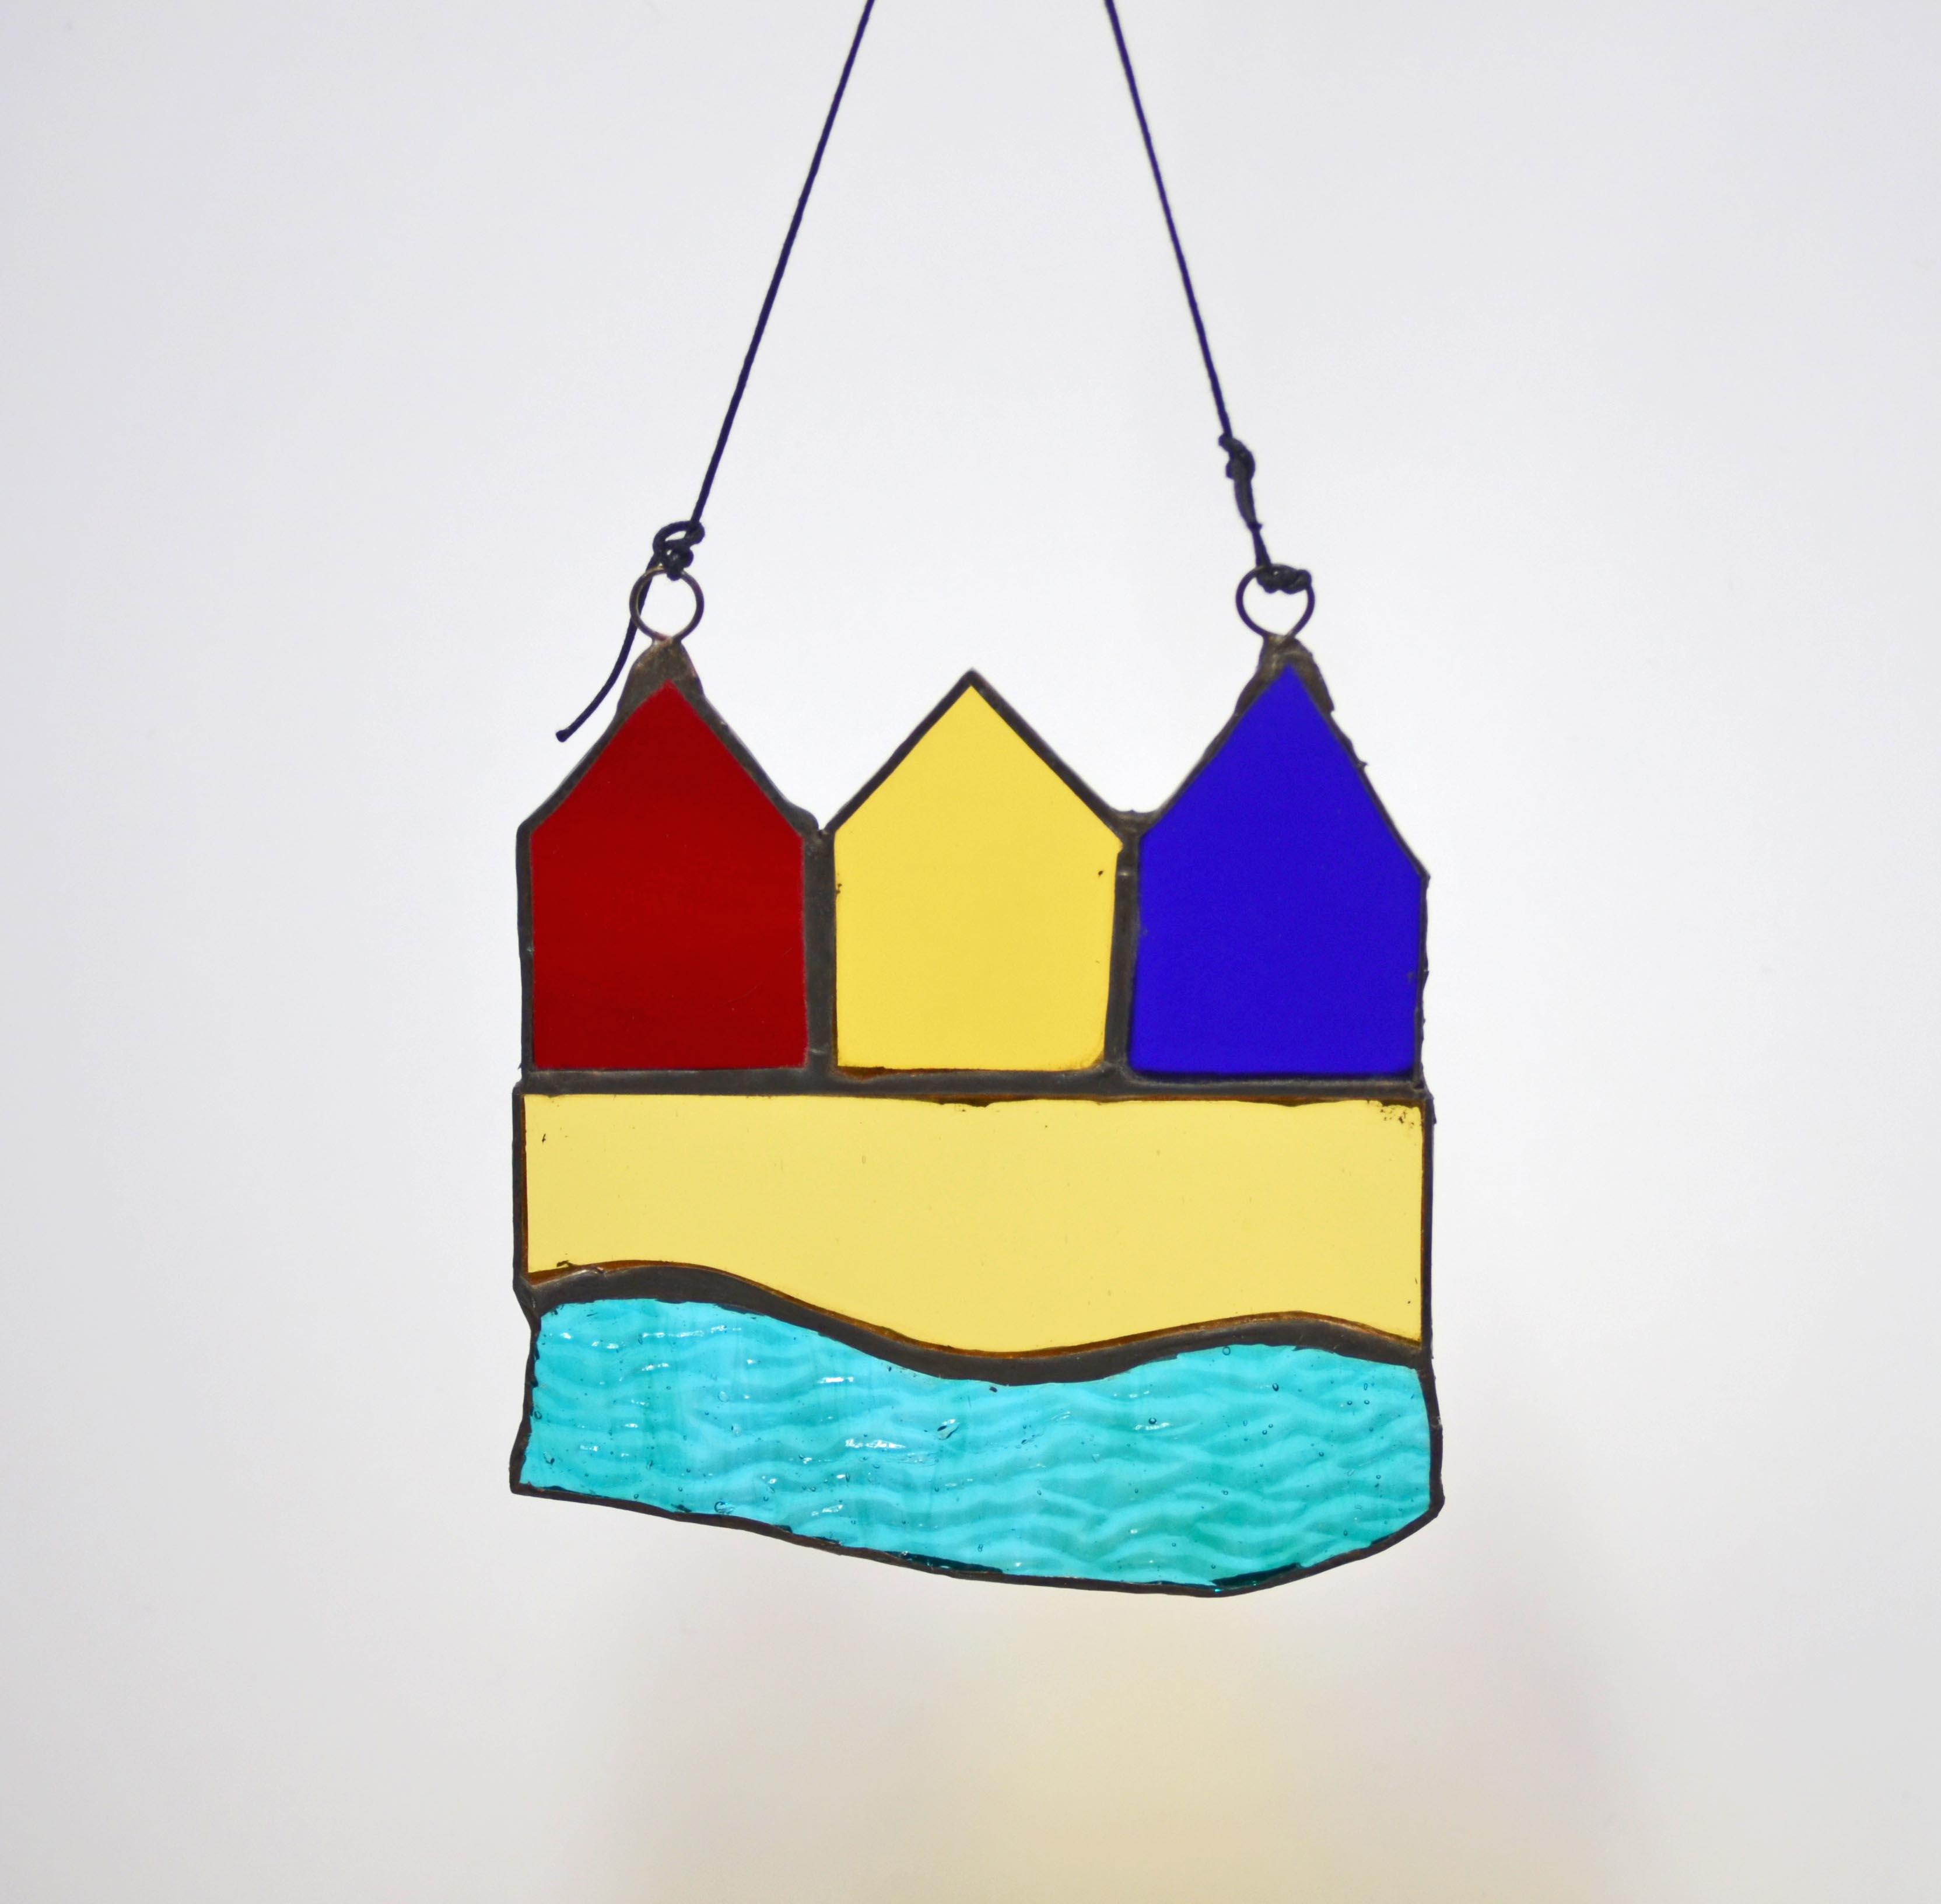 3 Beach Huts hanger, on chord